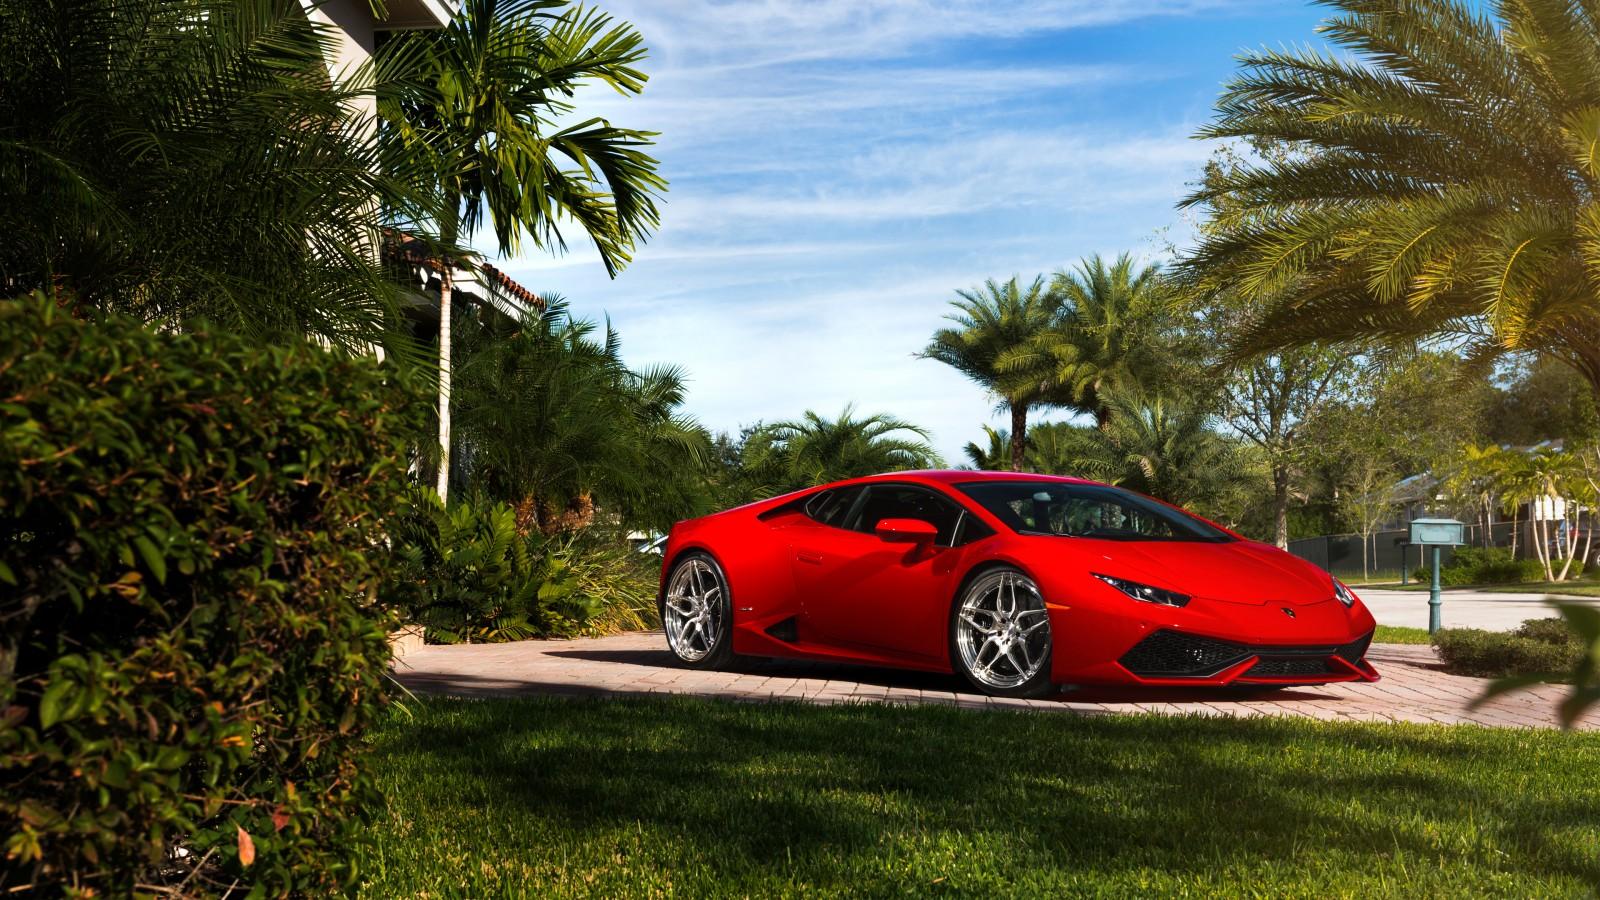 Bmw Luxury Cars Hd Wallpapers Adv1 Lamborghini Huracan 2 Wallpaper Hd Car Wallpapers